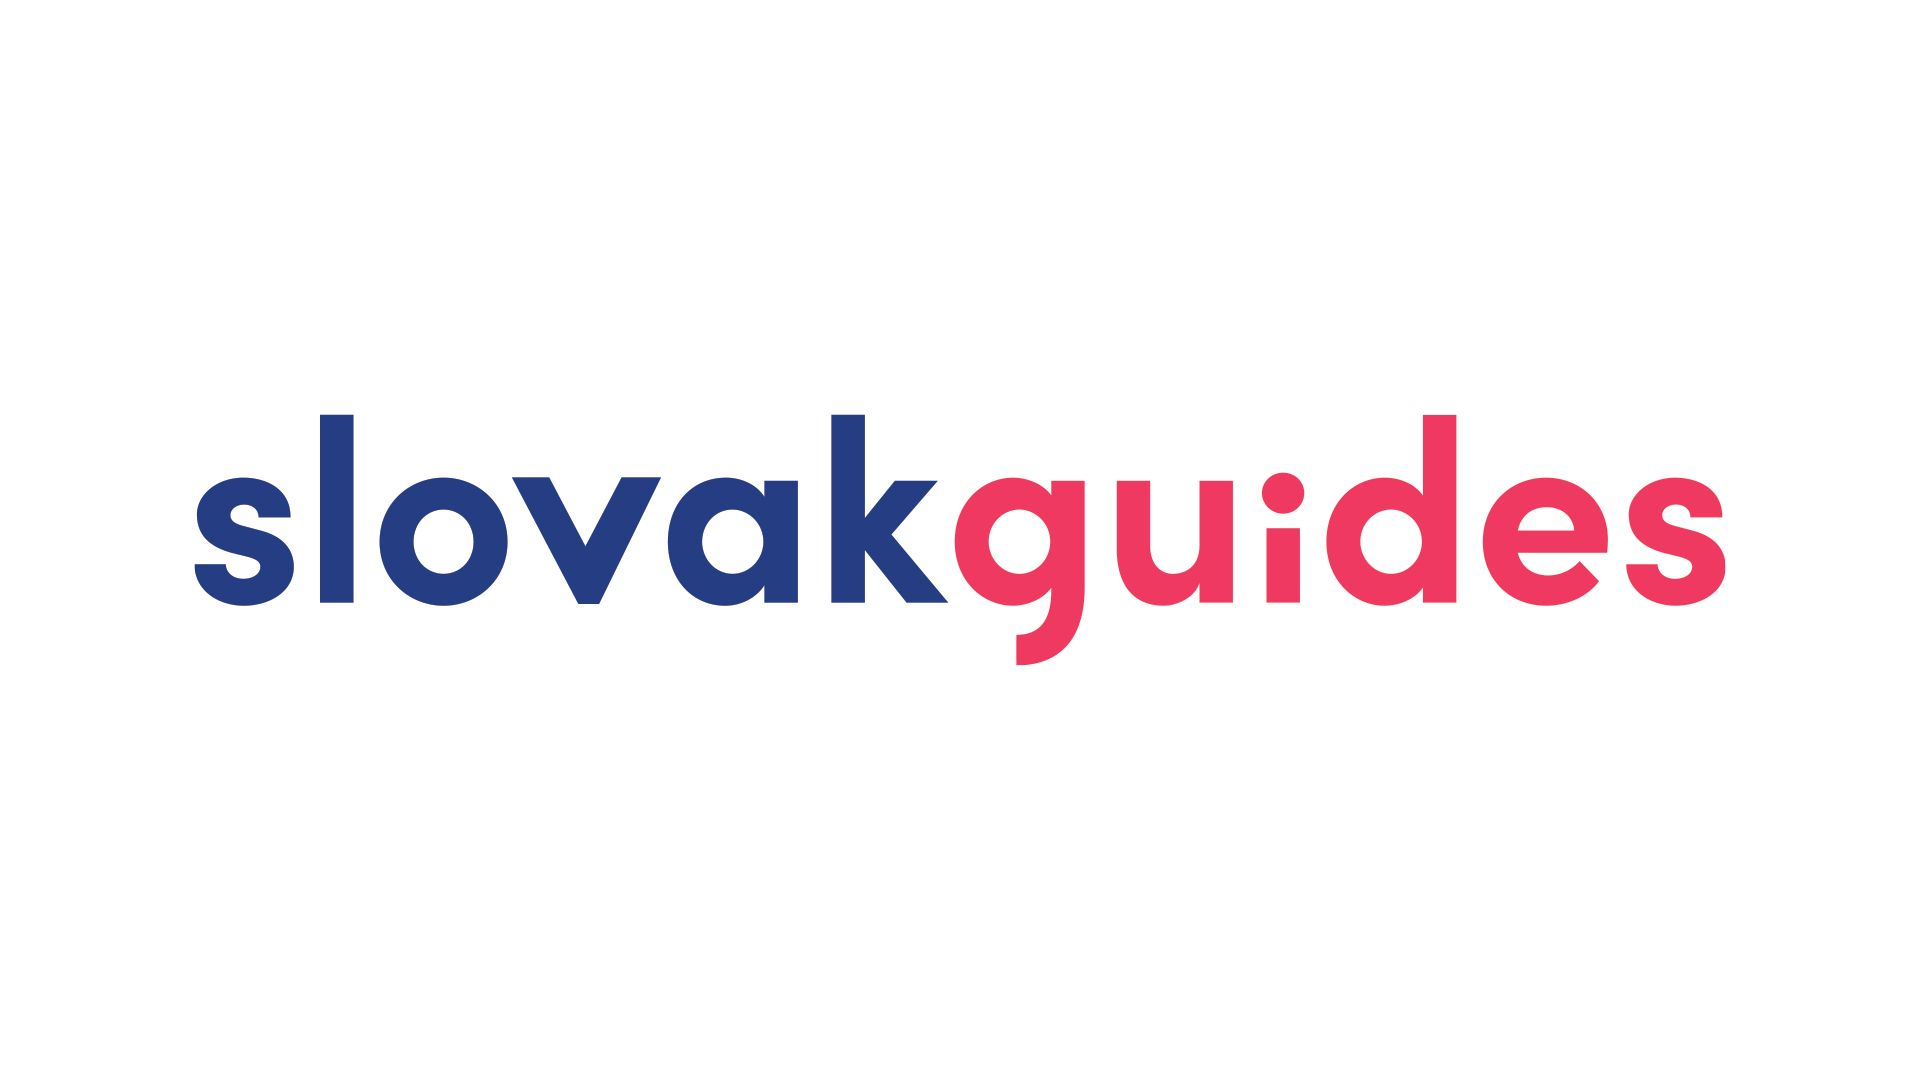 Slovak Guides